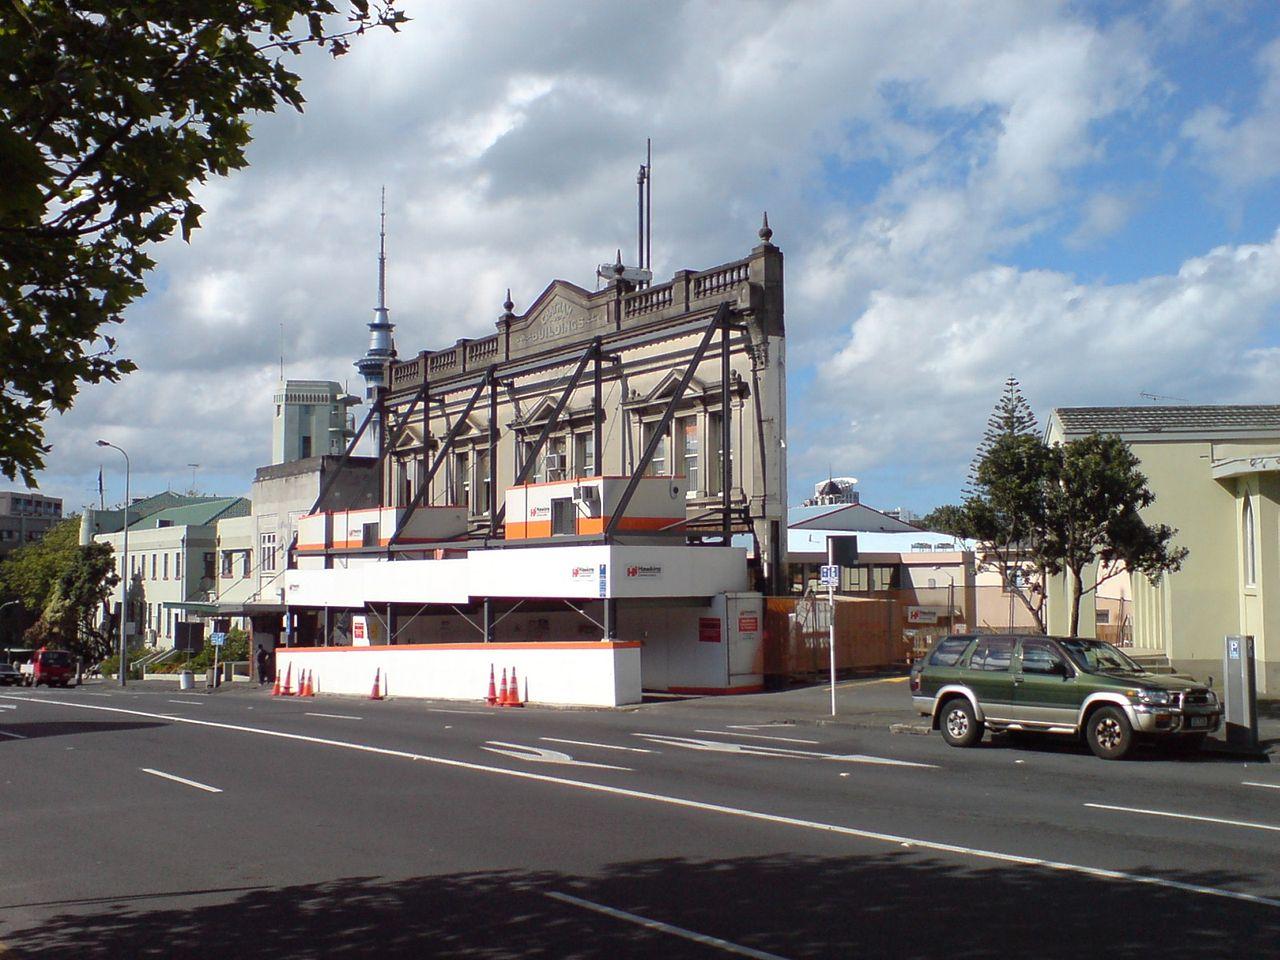 Potemkin Village Facade Auckland Ingolfson